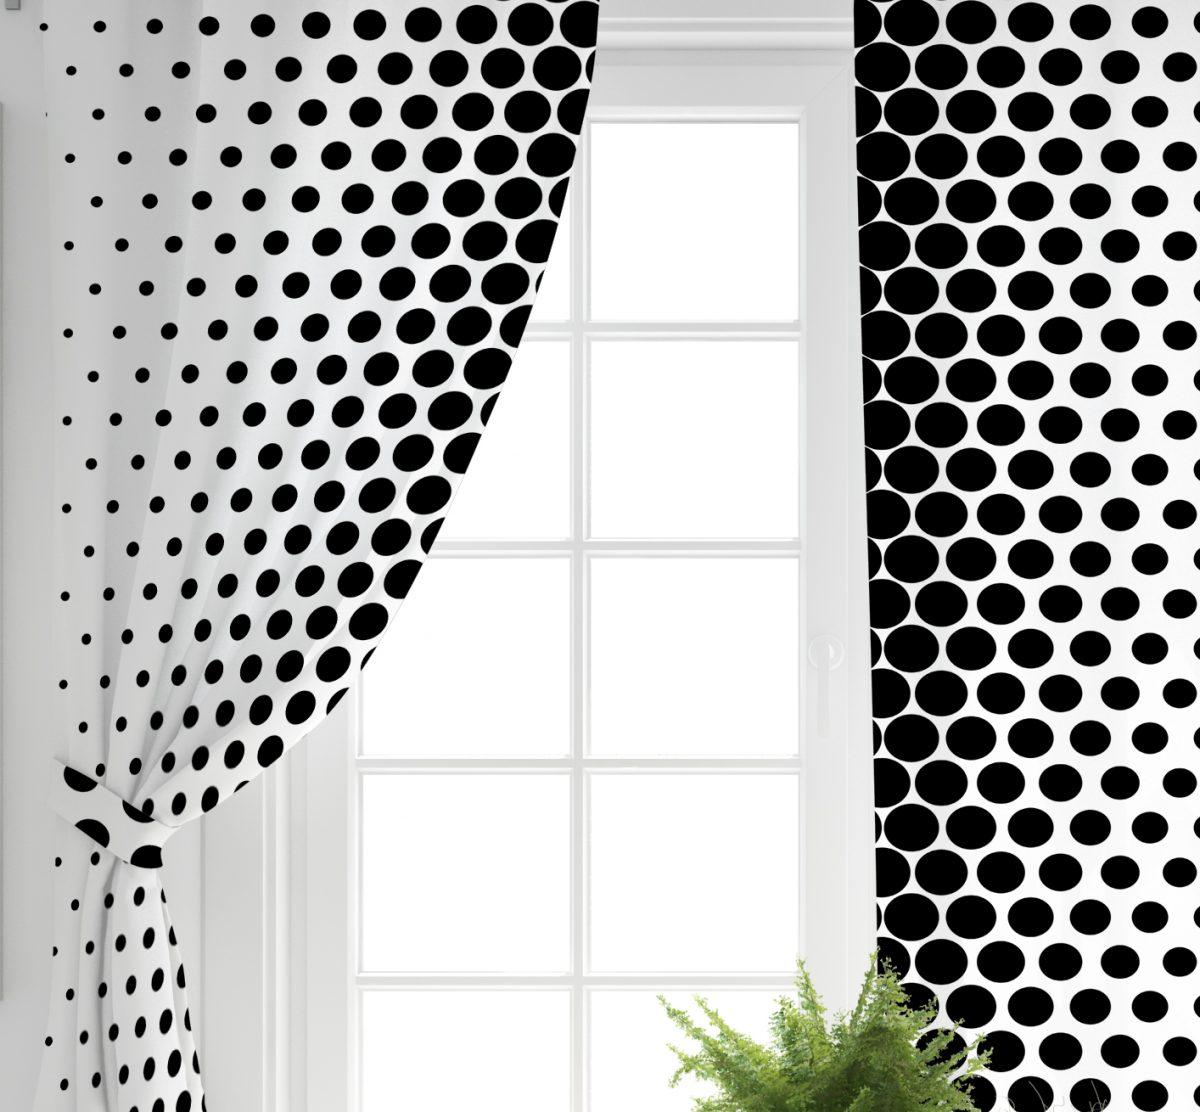 RealHomes Geometrik Desenli Dijital Baskılı 3D Fon Perde Realhomes